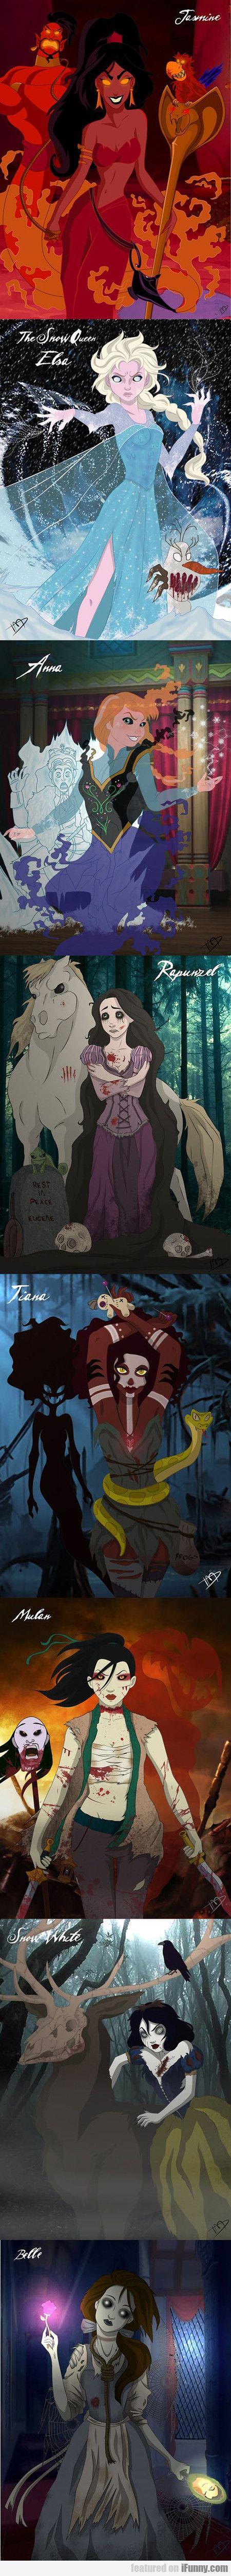 Creepy Zombie Disney Princesses #Funny-Pics http://www.flaproductions.net/funny-pics/creepy-zombie-disney-princesses/34743/?utm_source=PN&utm_medium=http%3A%2F%2Fwww.pinterest.com%2Falliefernandez3%2Fgreat%2F&utm_campaign=FlaProductions